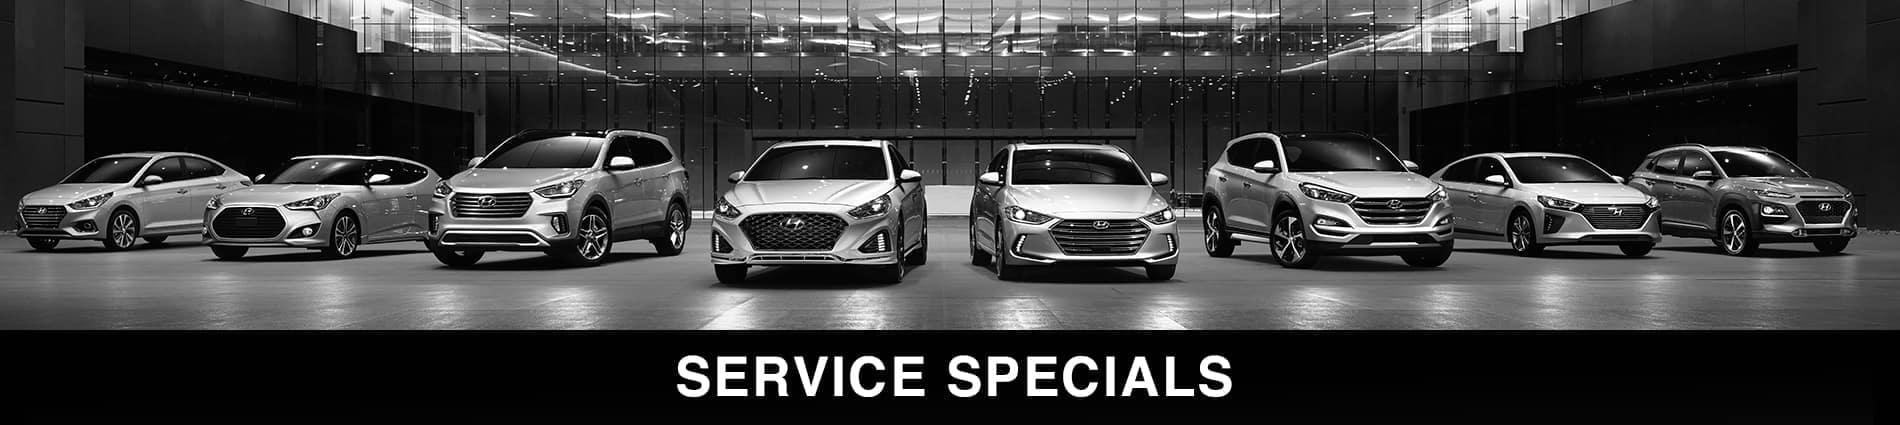 hyundai-m6-service-specials